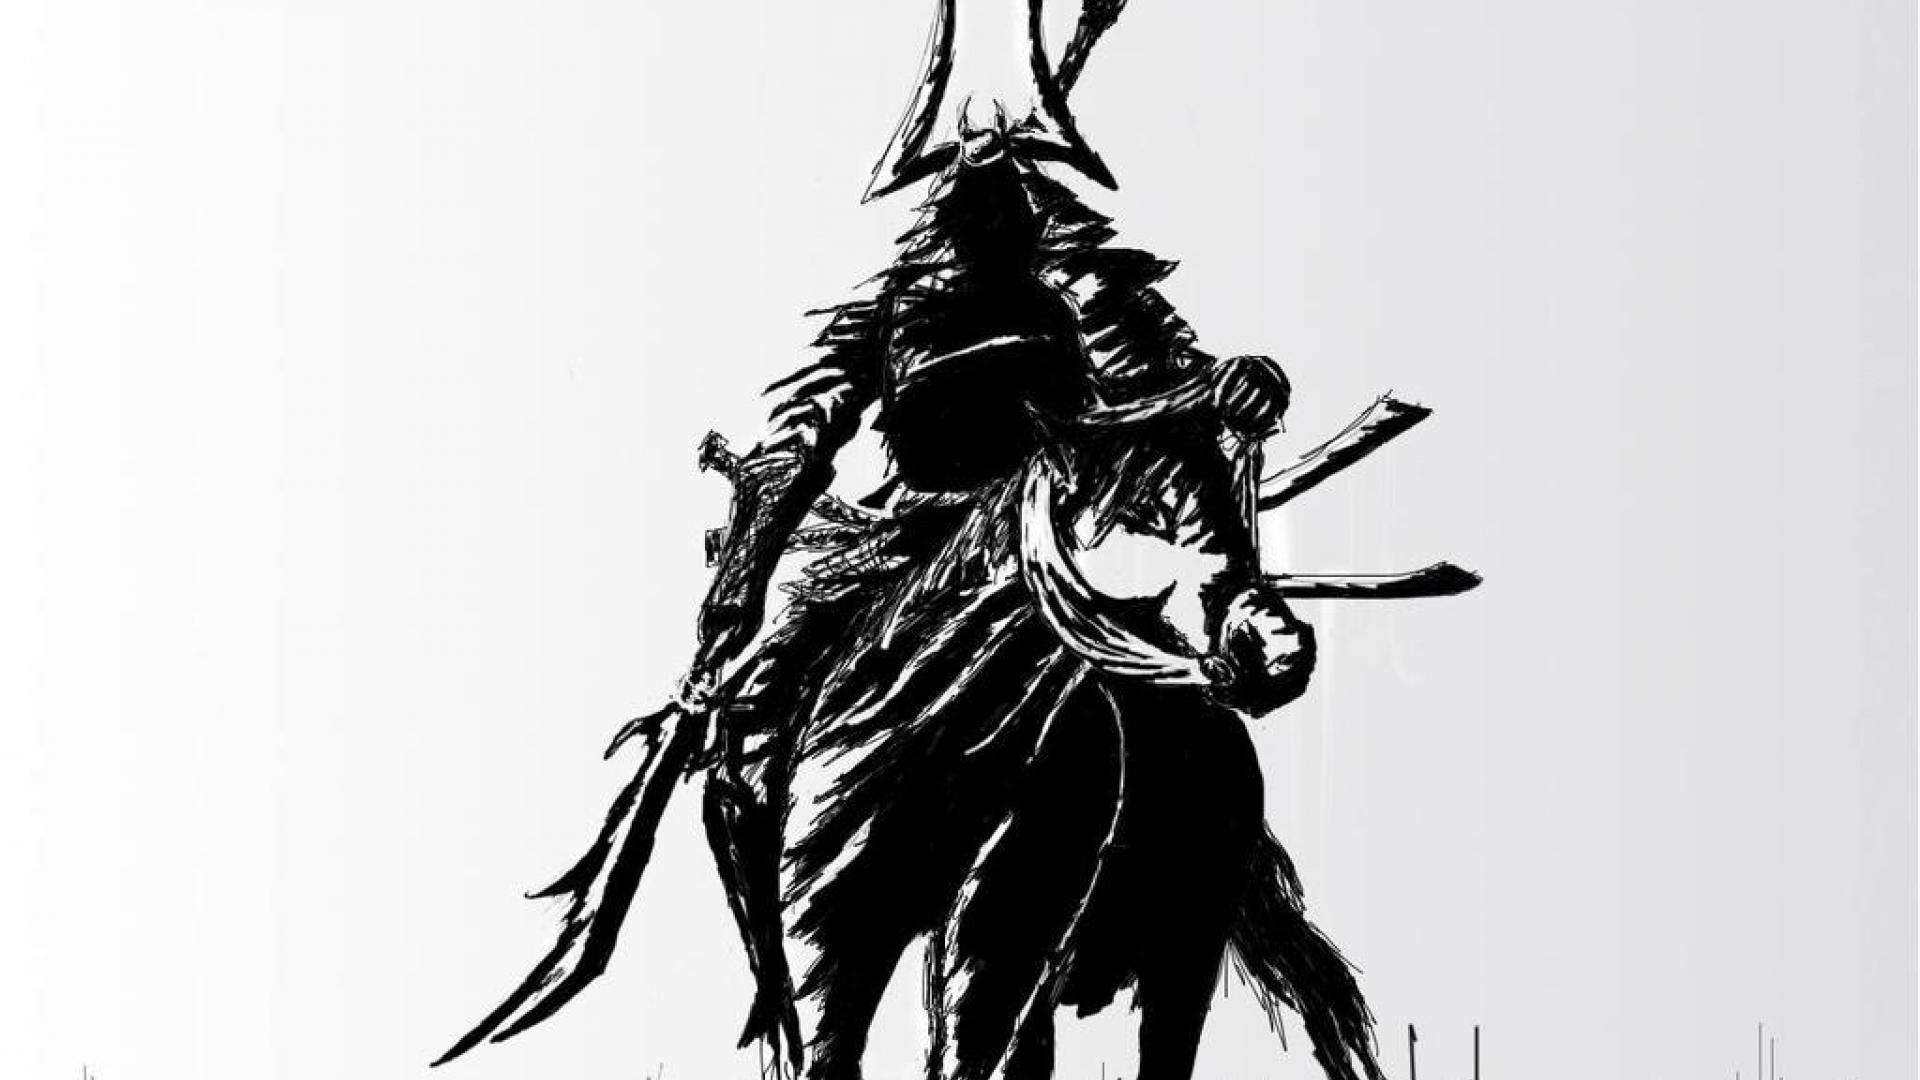 Samurai Hd Wallpaper Background Image 1920x1080 Id 434647